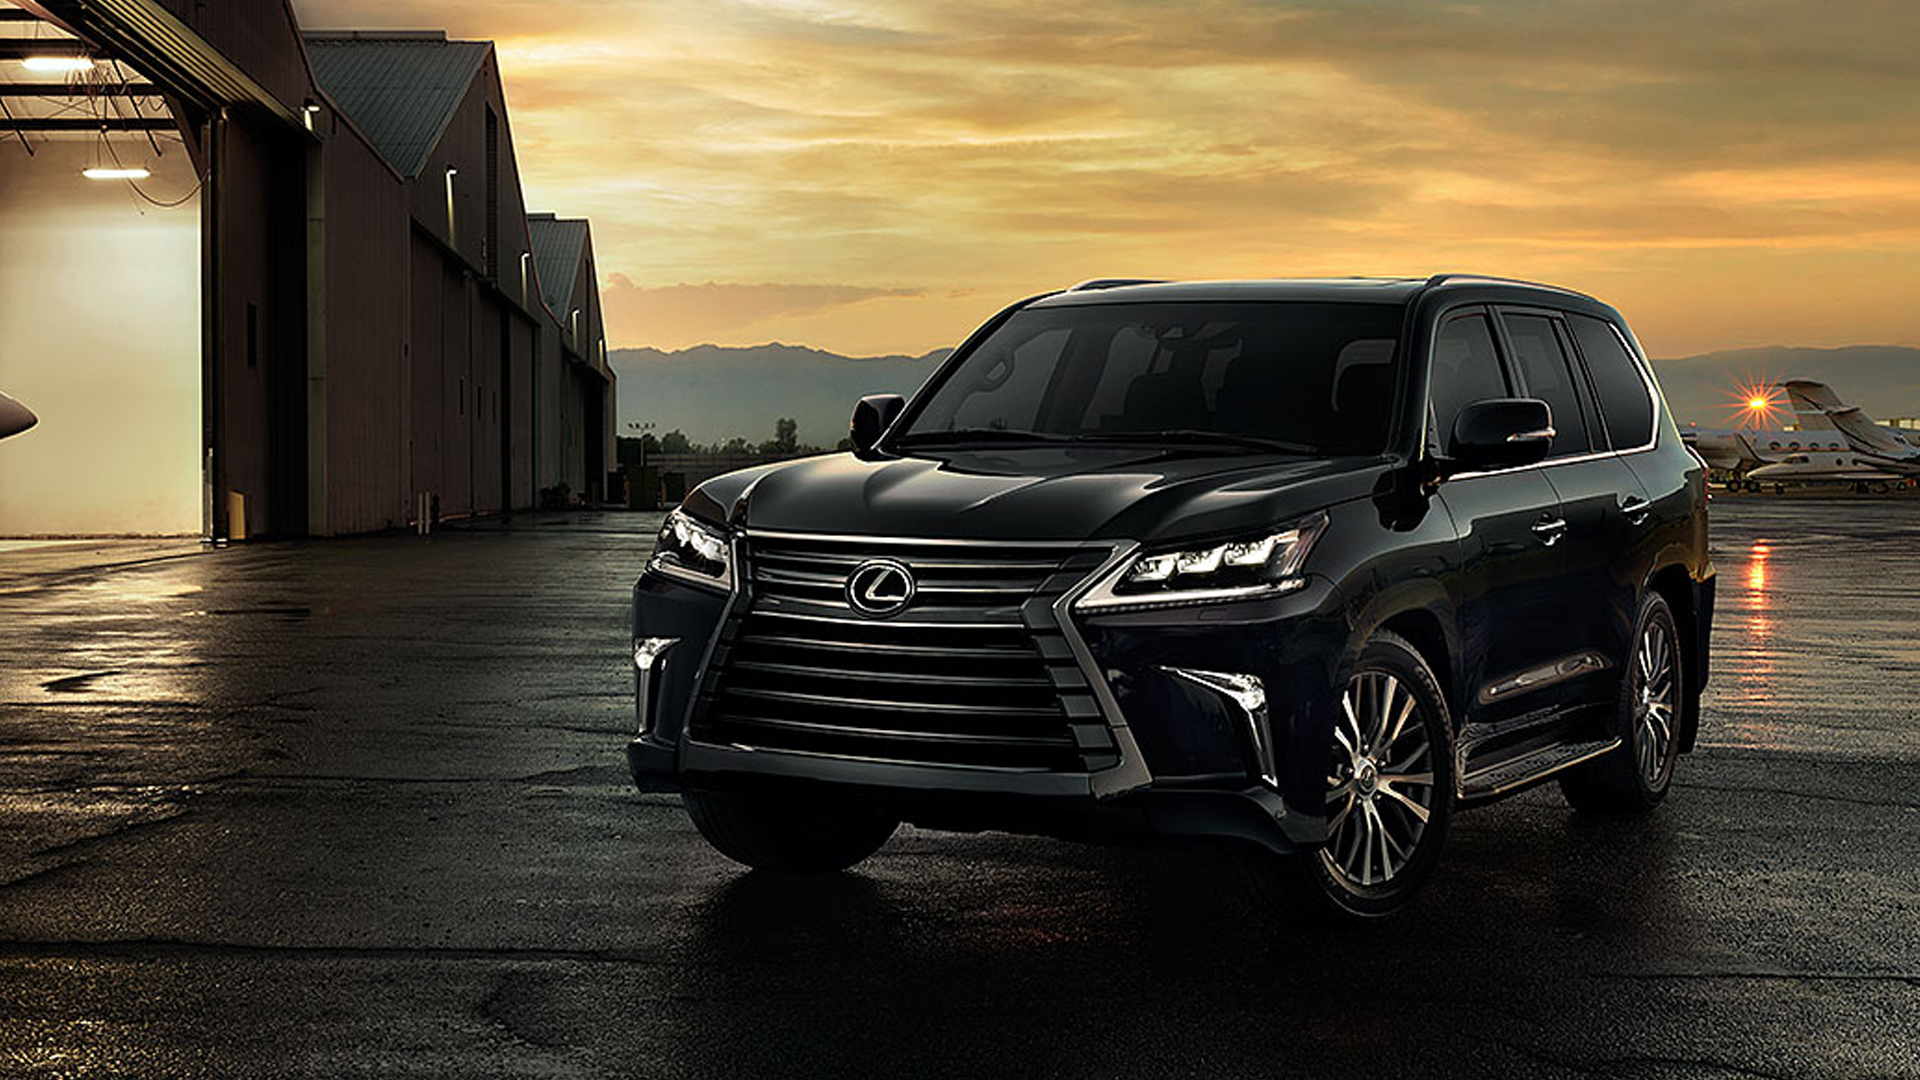 Lexus LX 570 2018 - Price, Mileage, Reviews, Specification ...